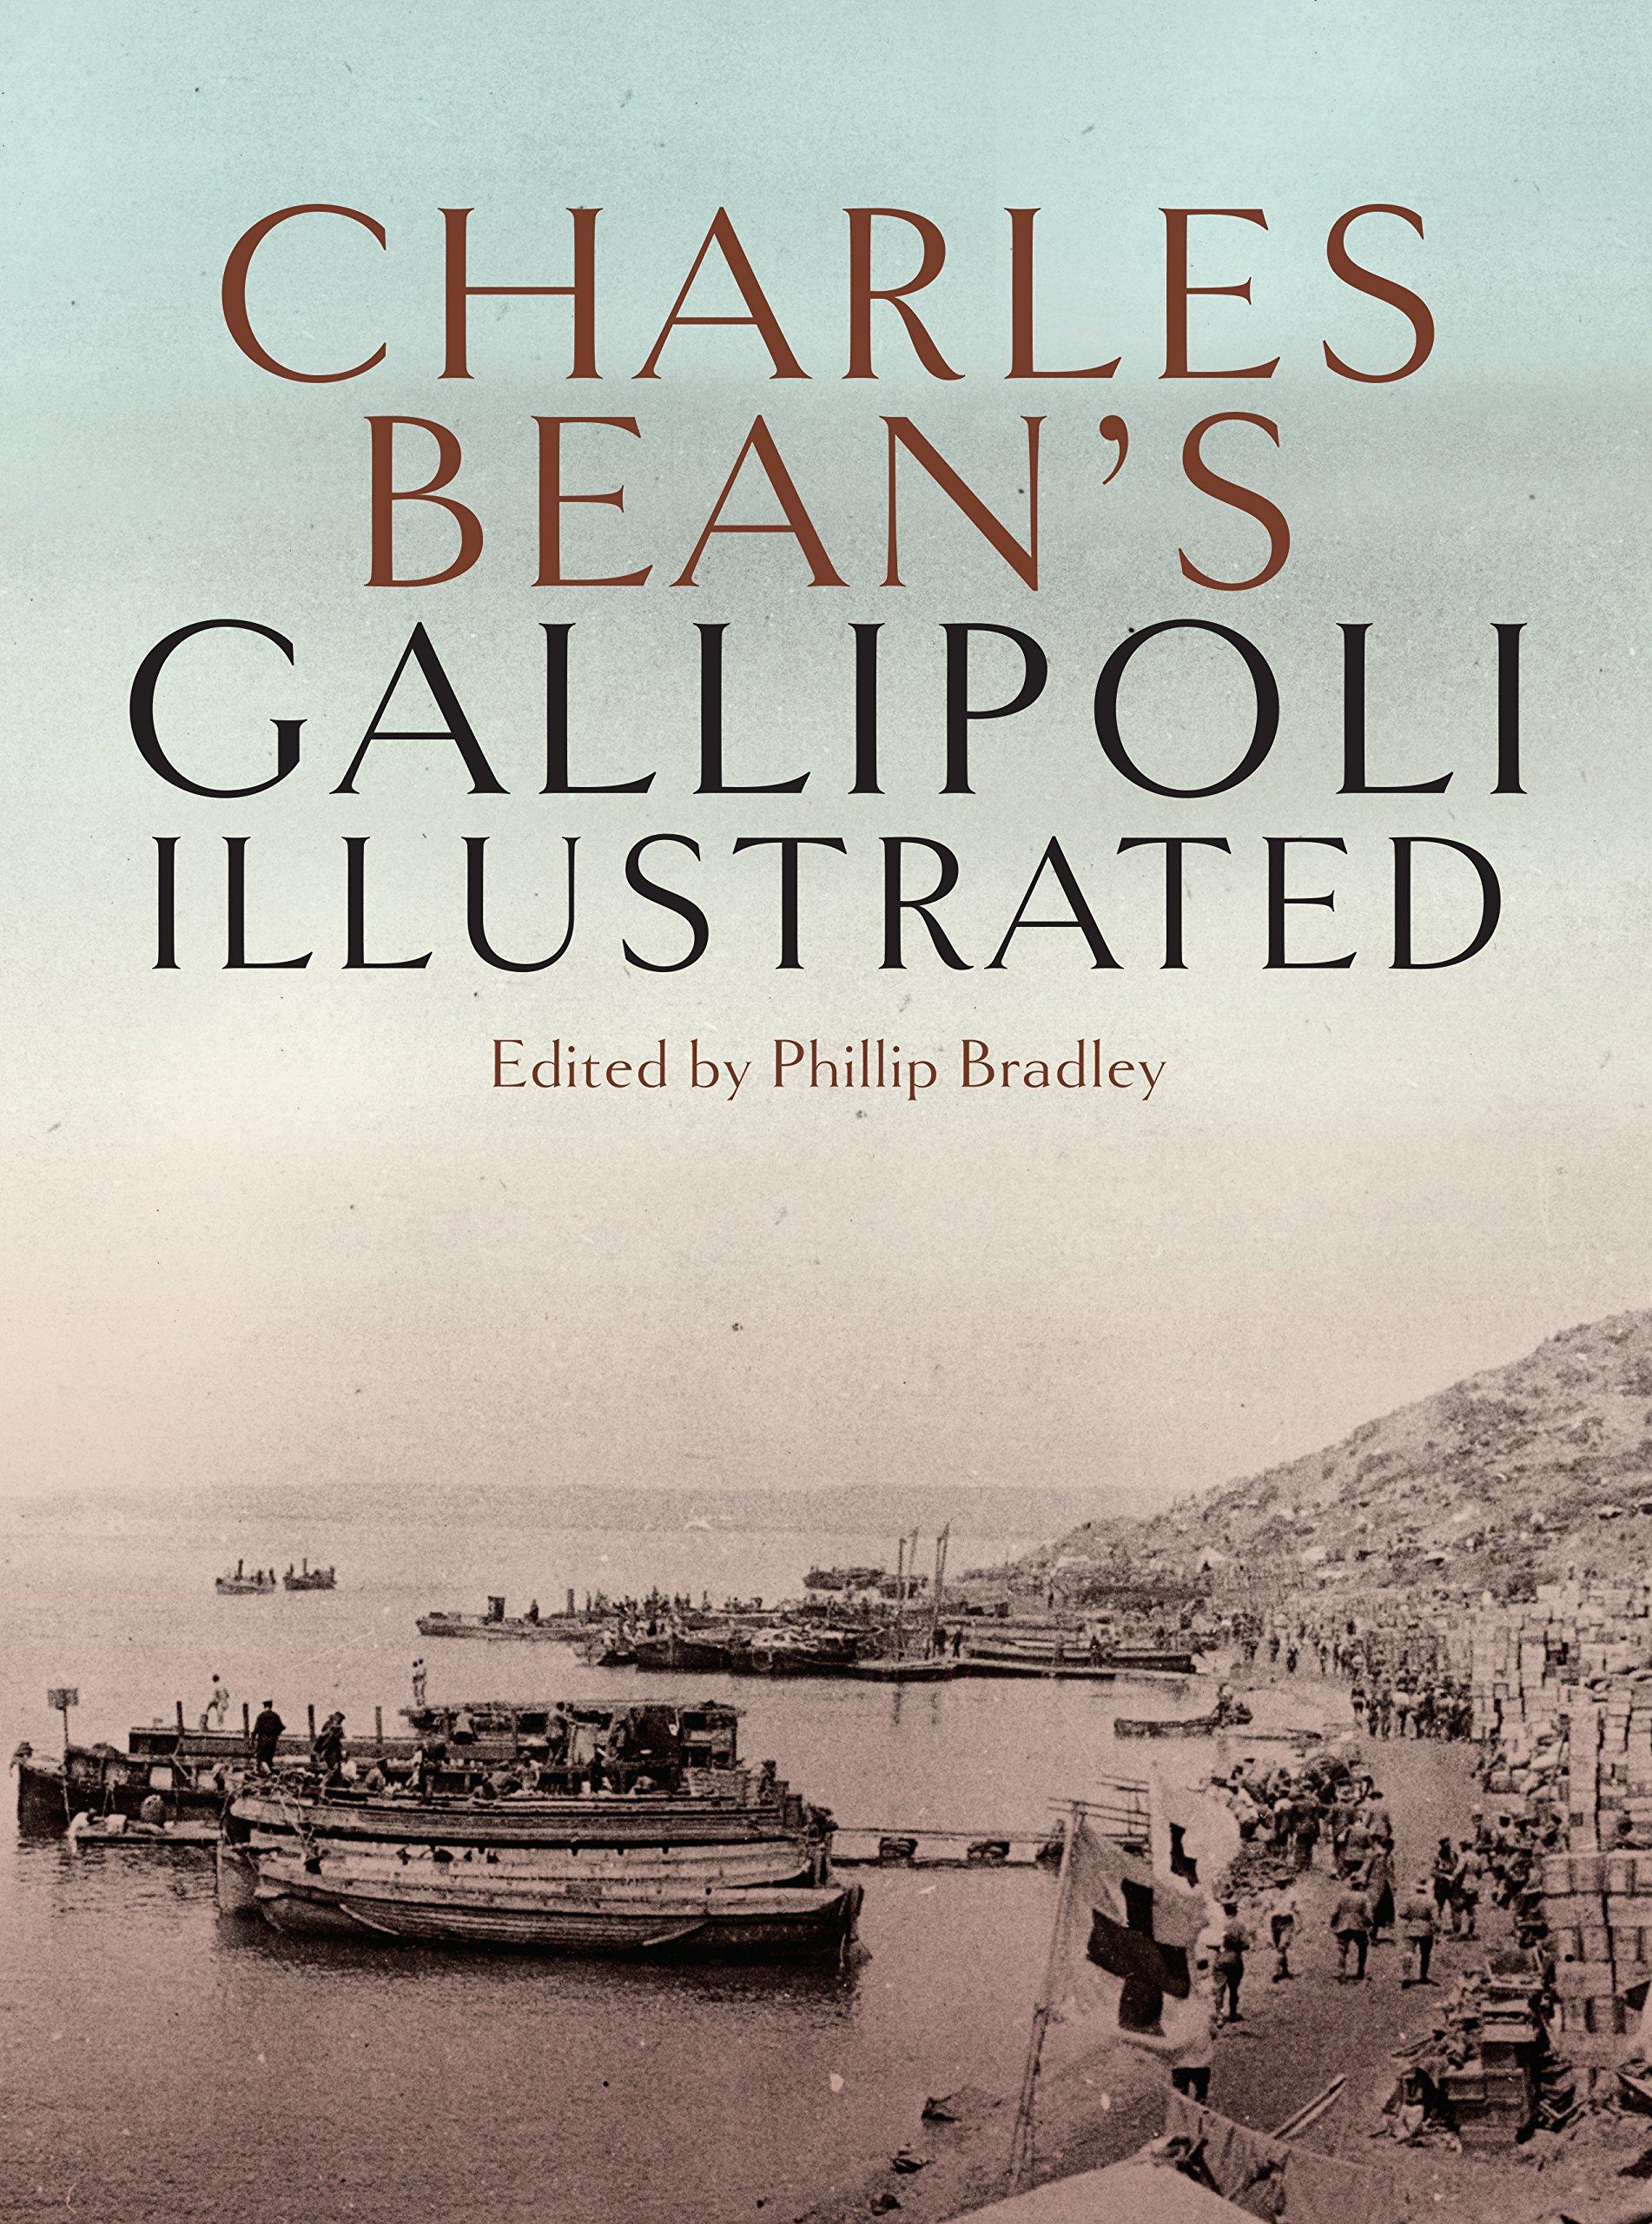 Charles Bean's Gallipoli: Illustrated